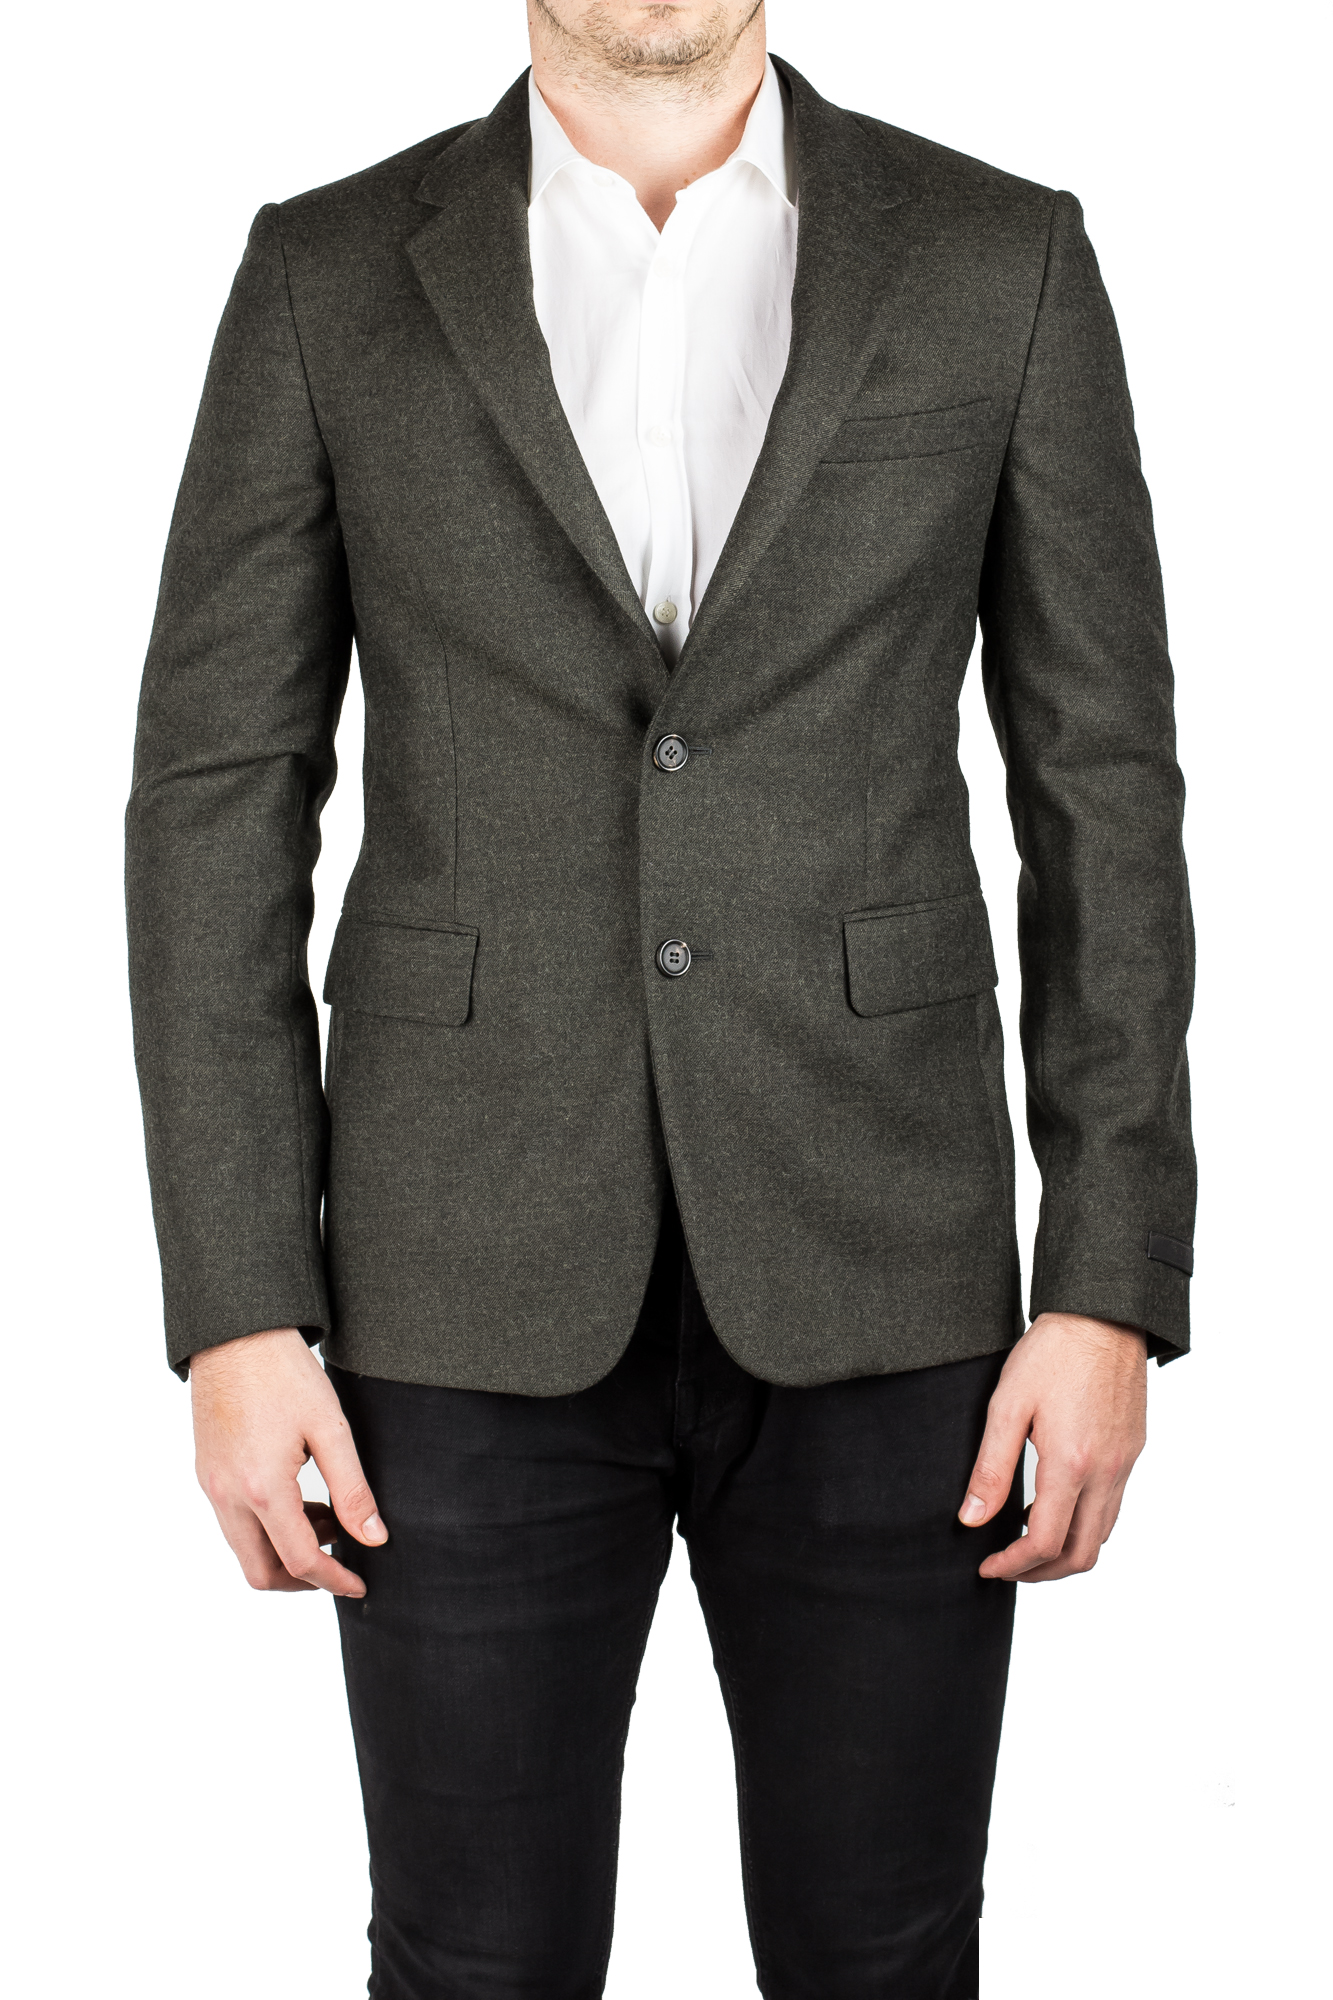 Prada Men's Notched Lapel Virgin Wool Viscose Sport Jacket Coat Blazer Olive by Prada